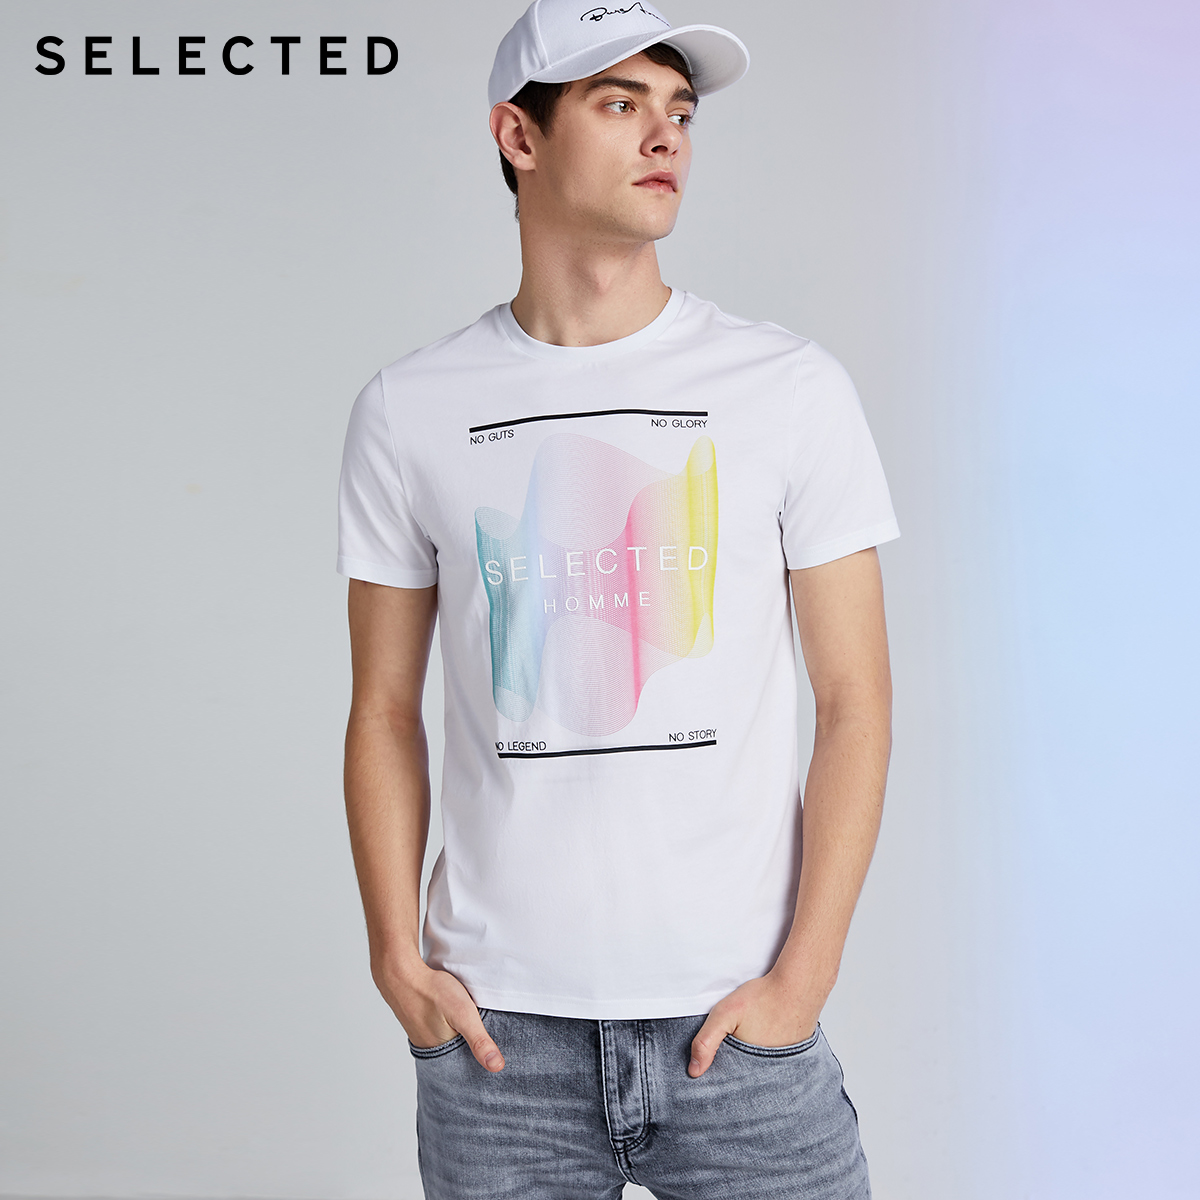 SELECTED Men's 100% Cotton Letter Print Short-sleeved T-shirt S|420201515